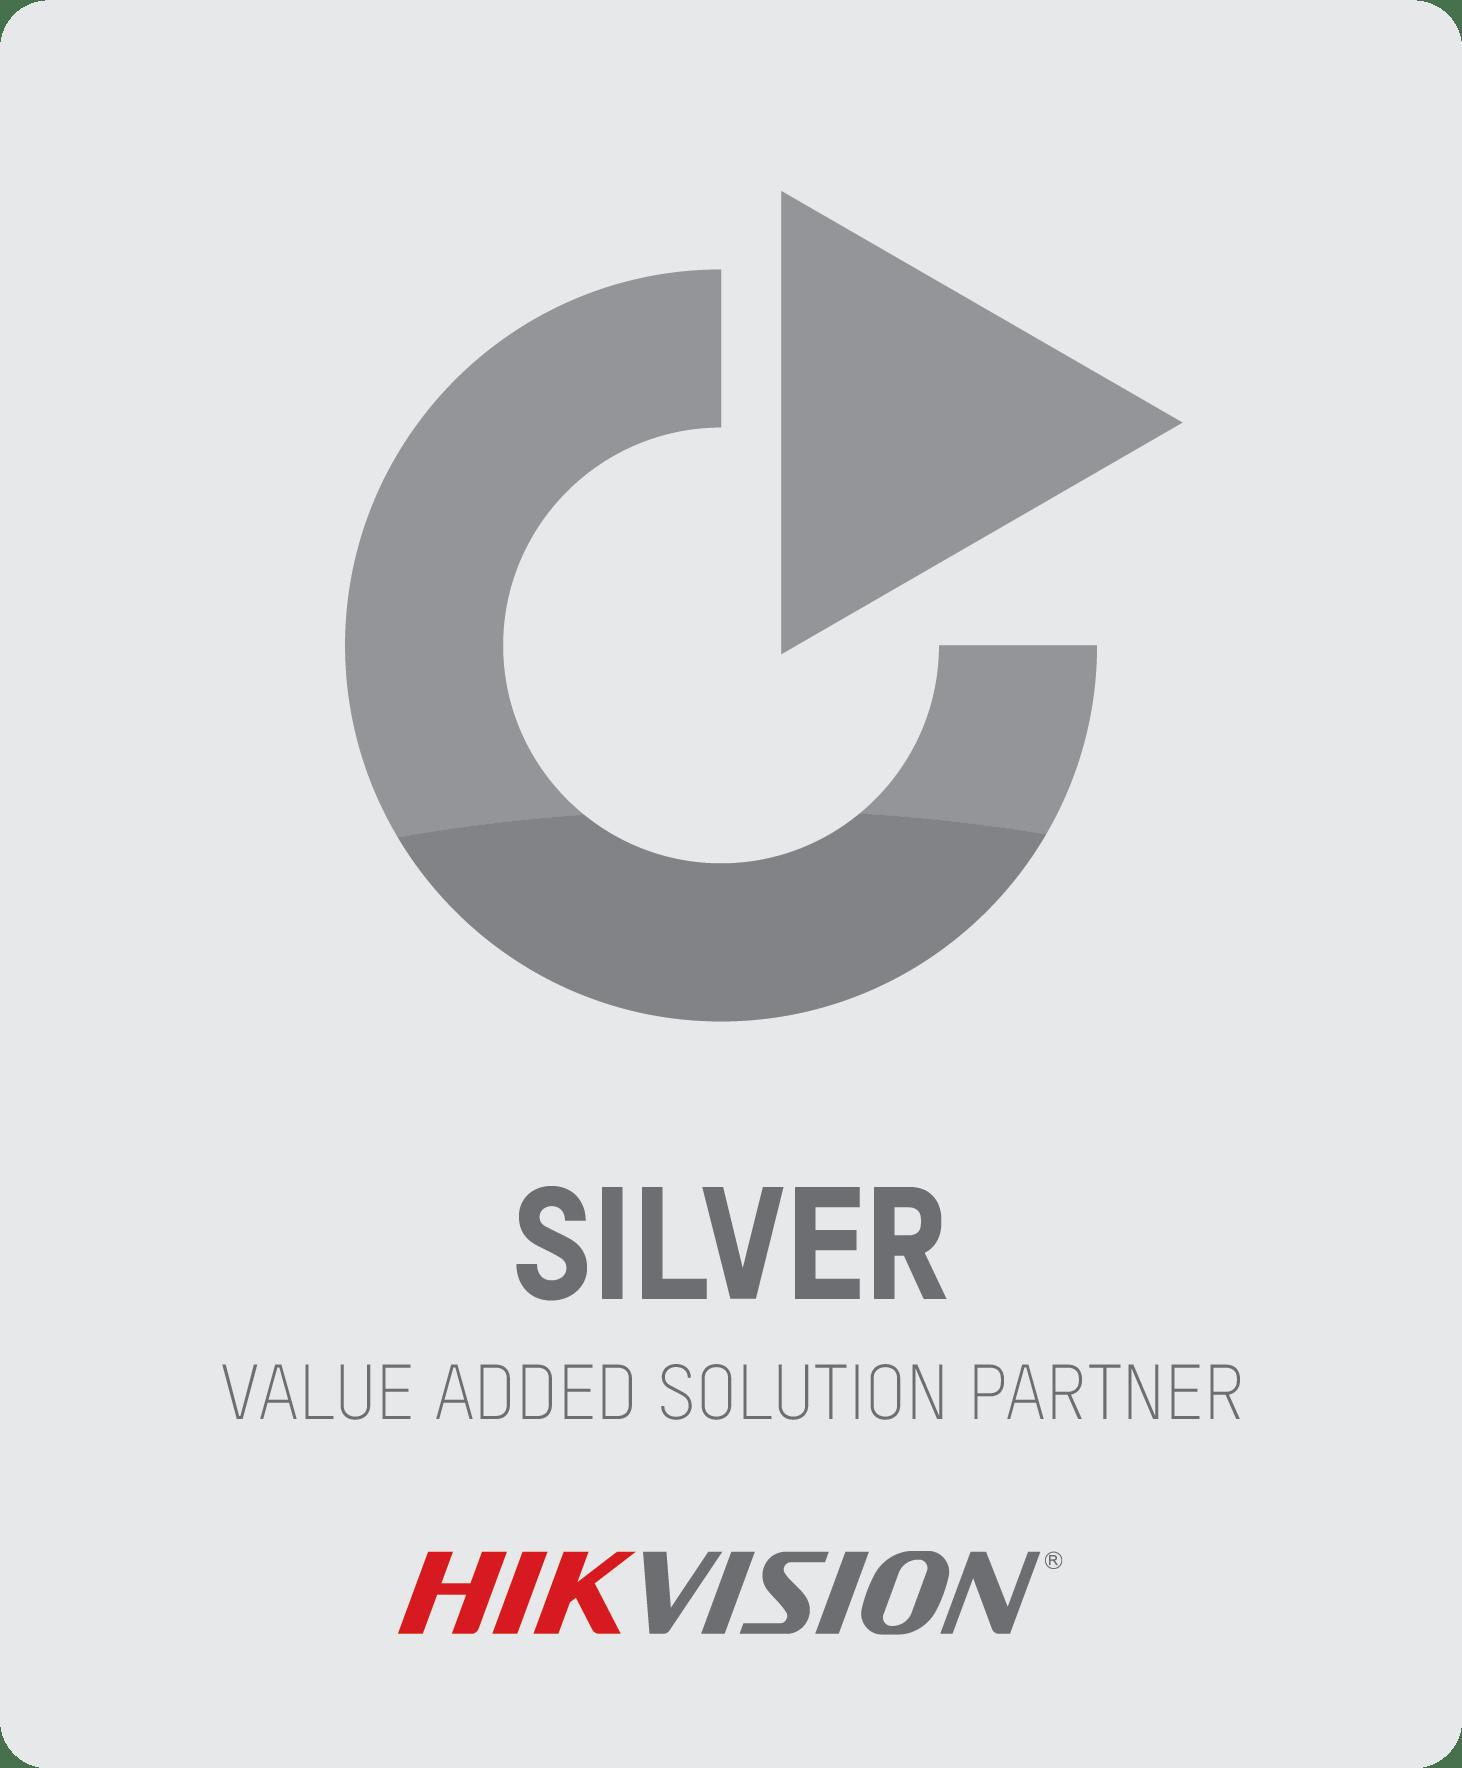 Hikvision Silver VASP